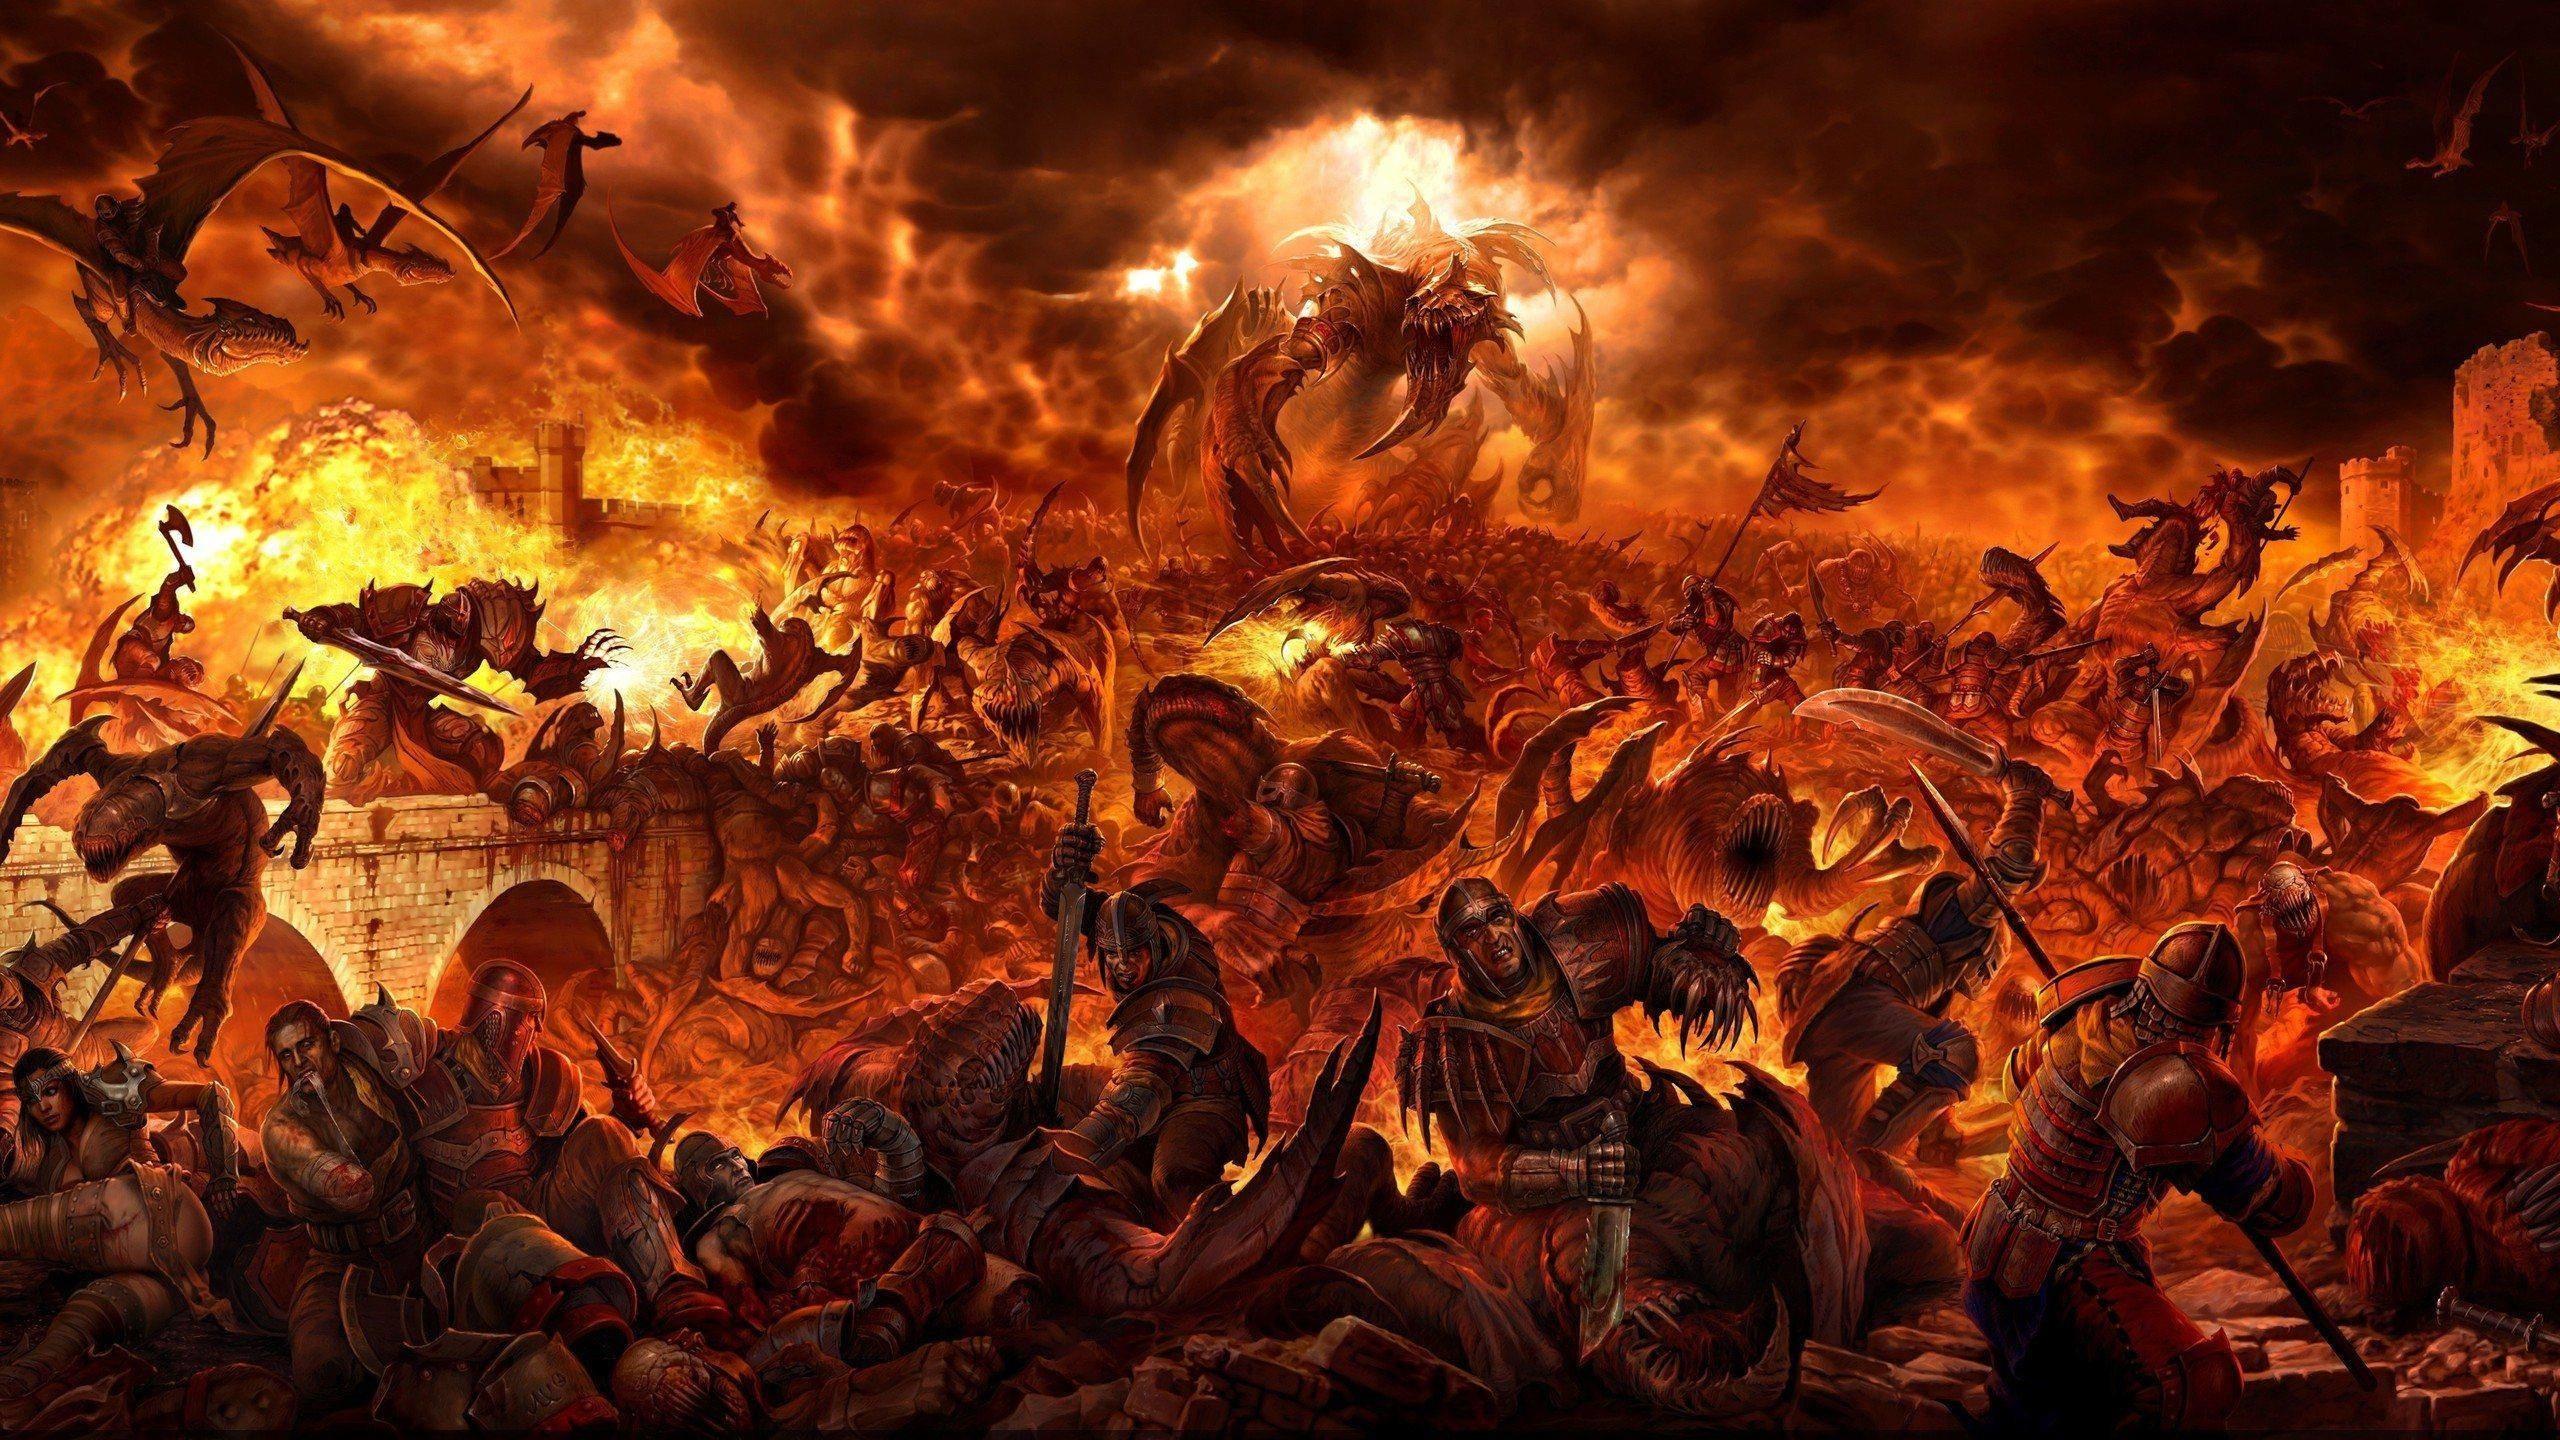 HD Imaginary hell Wallpaper Free